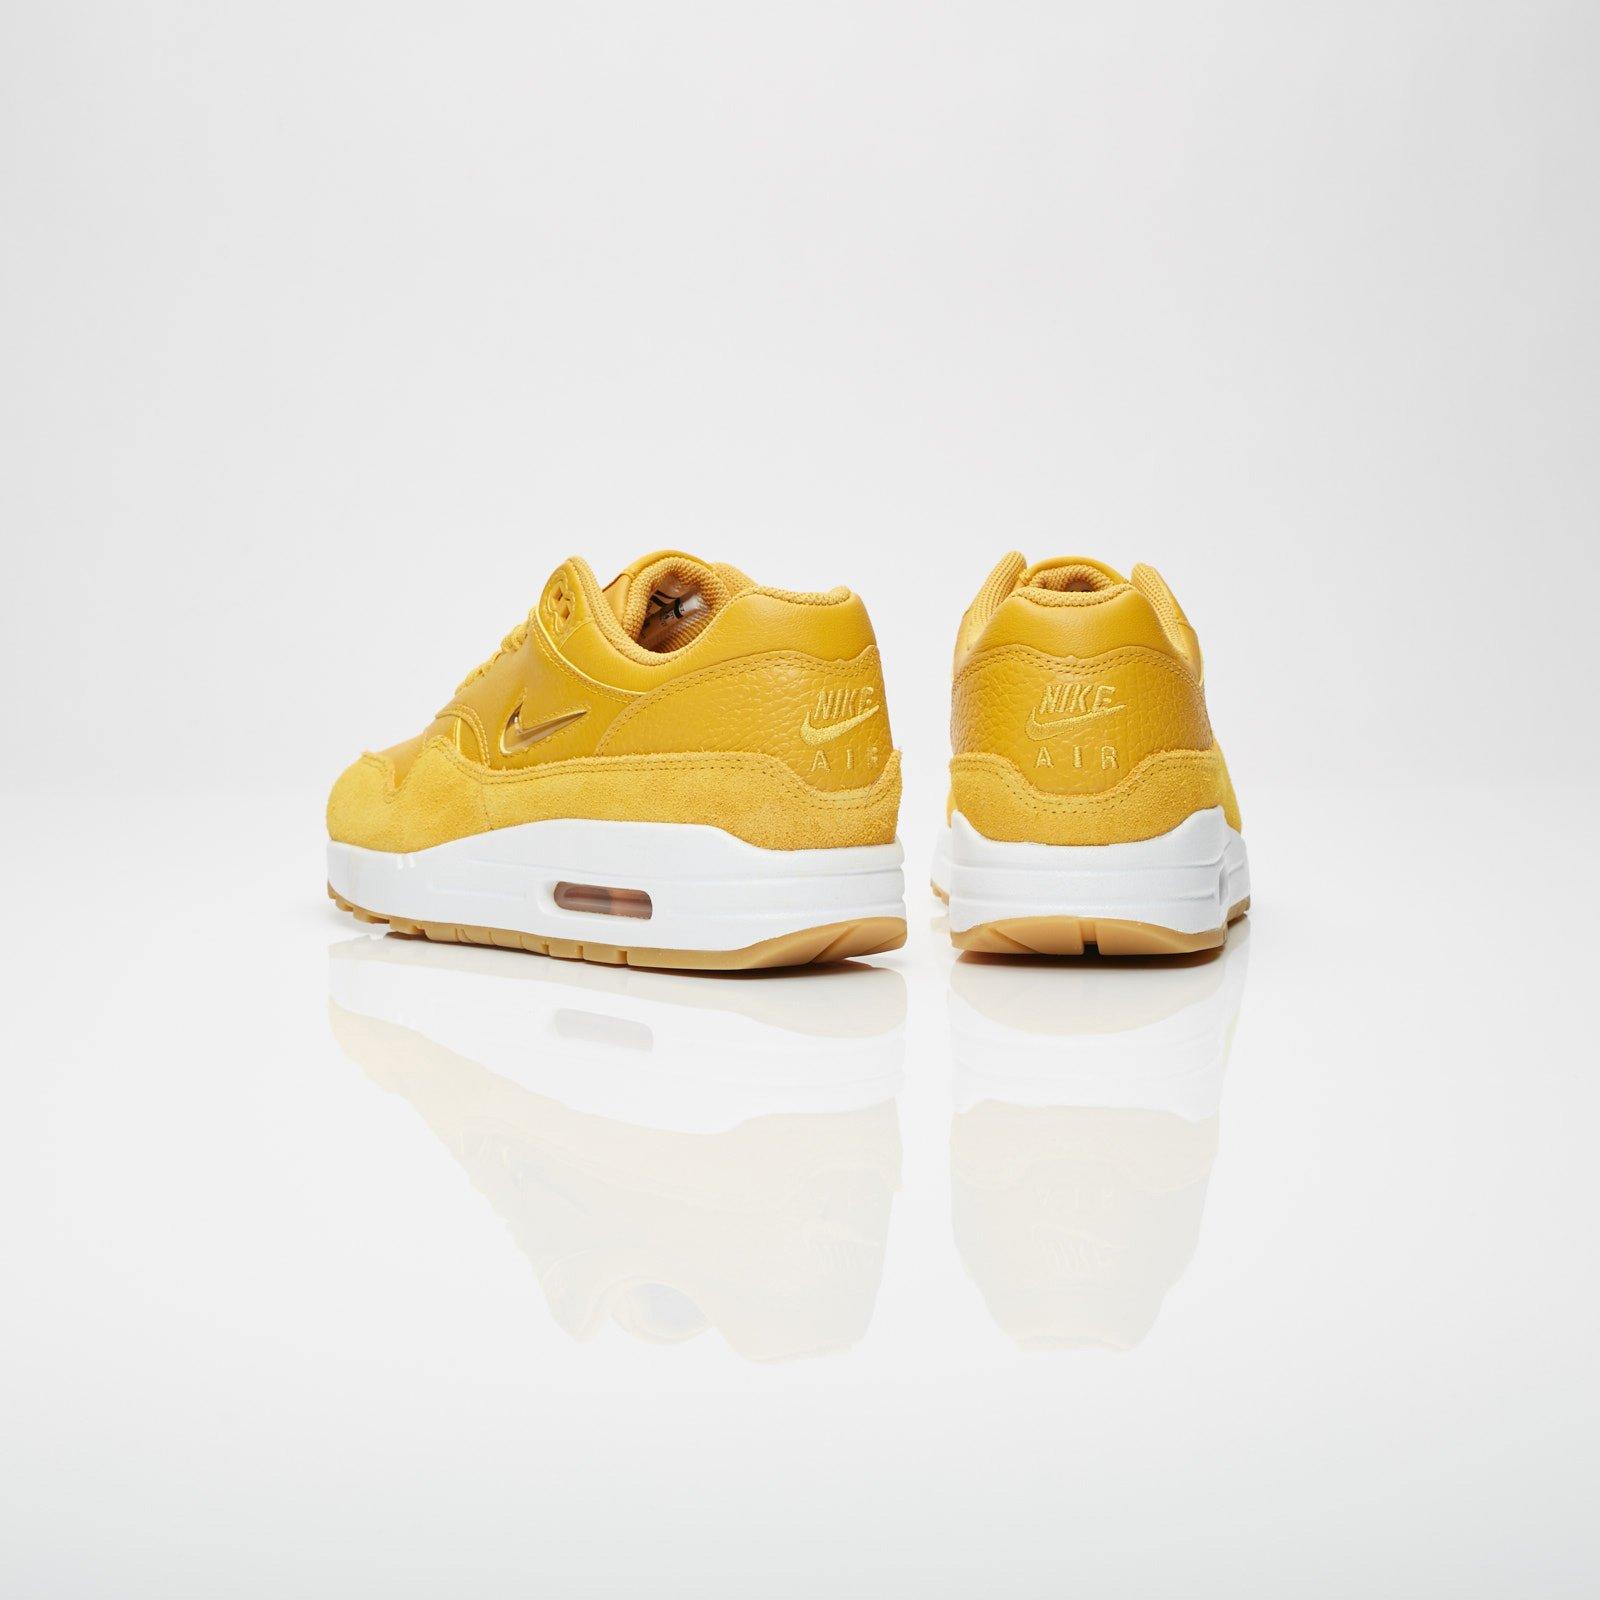 sale retailer c22bf 48227 Nike Wmns Air Max 1 Premium SC - Aa0512-700 - Sneakersnstuff | sneakers &  streetwear online since 1999